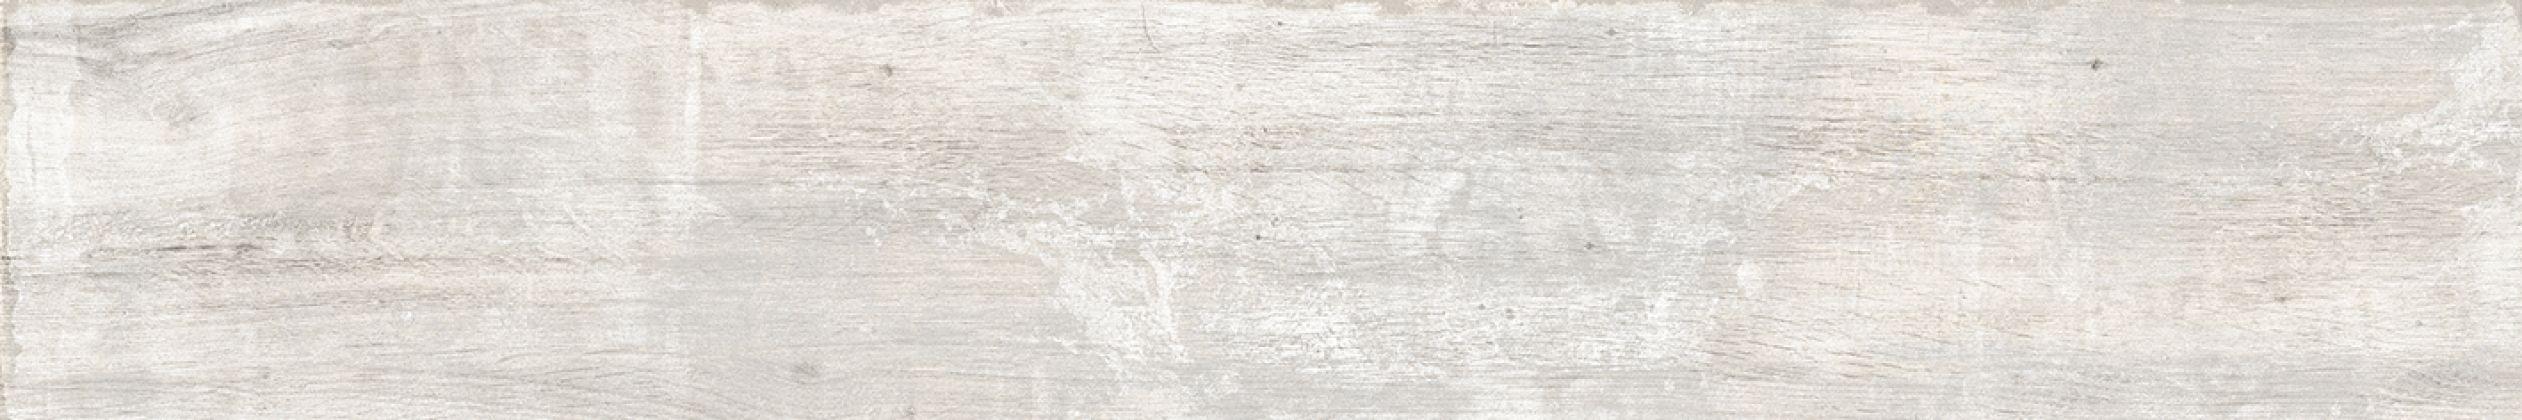 Pale Wood Керамогранит K-551/MR/ Светло-серый 20x120